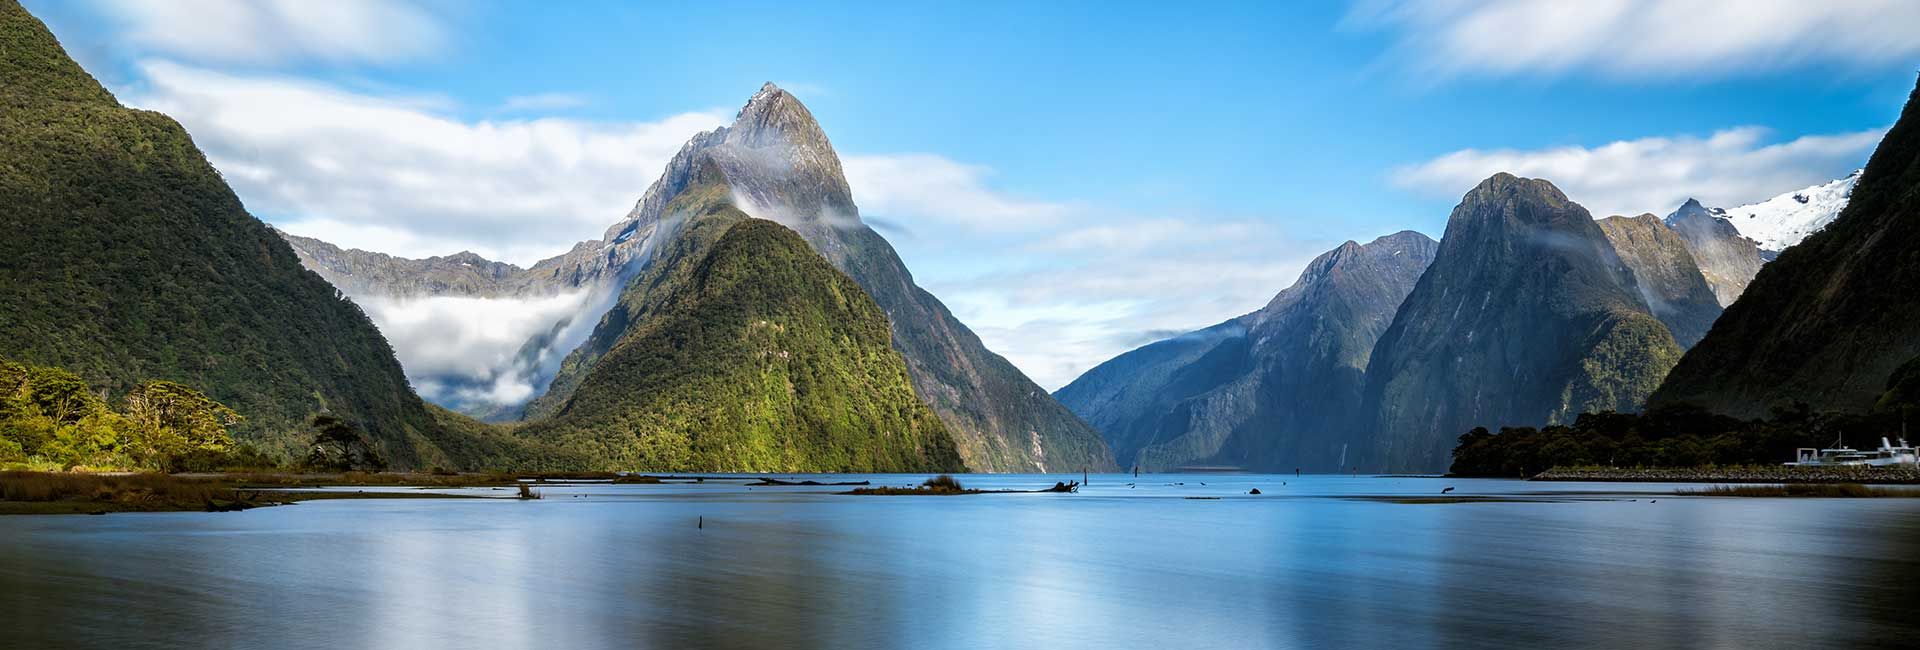 South Pacific Mountains sailing destinations